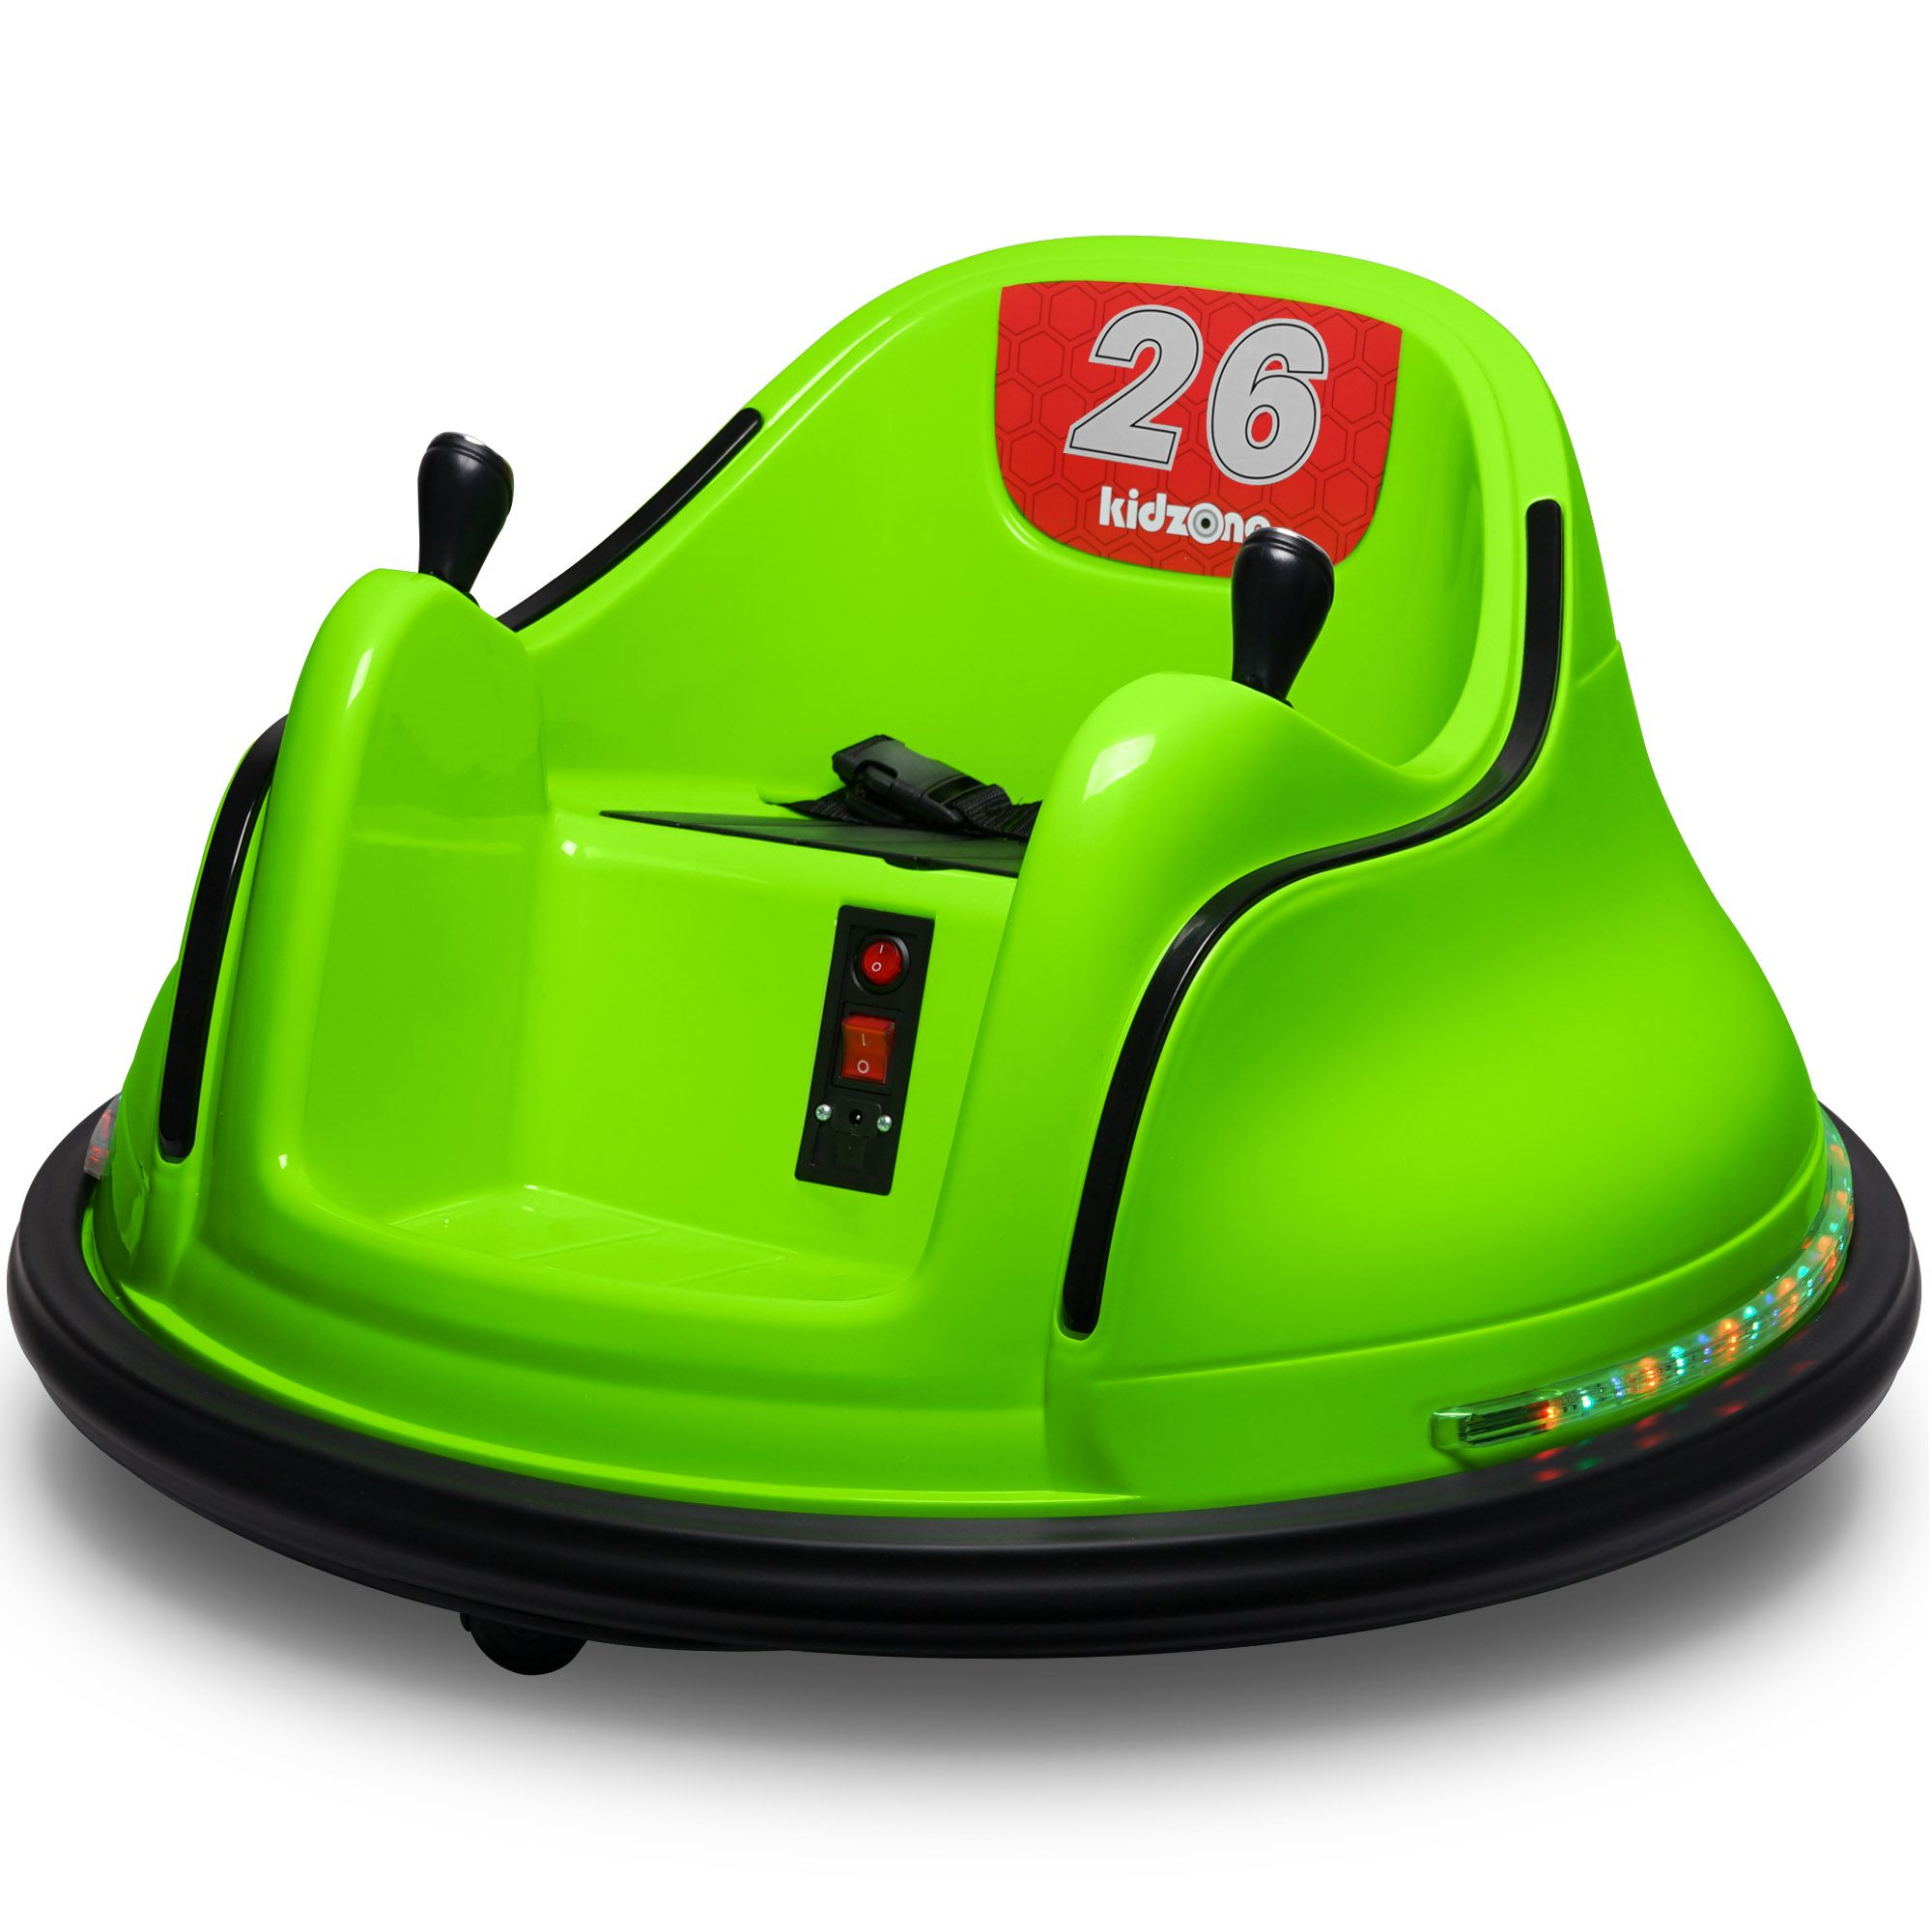 Kidzone DIY Number 6V Kids Toy Electric Ride On Bumper Car